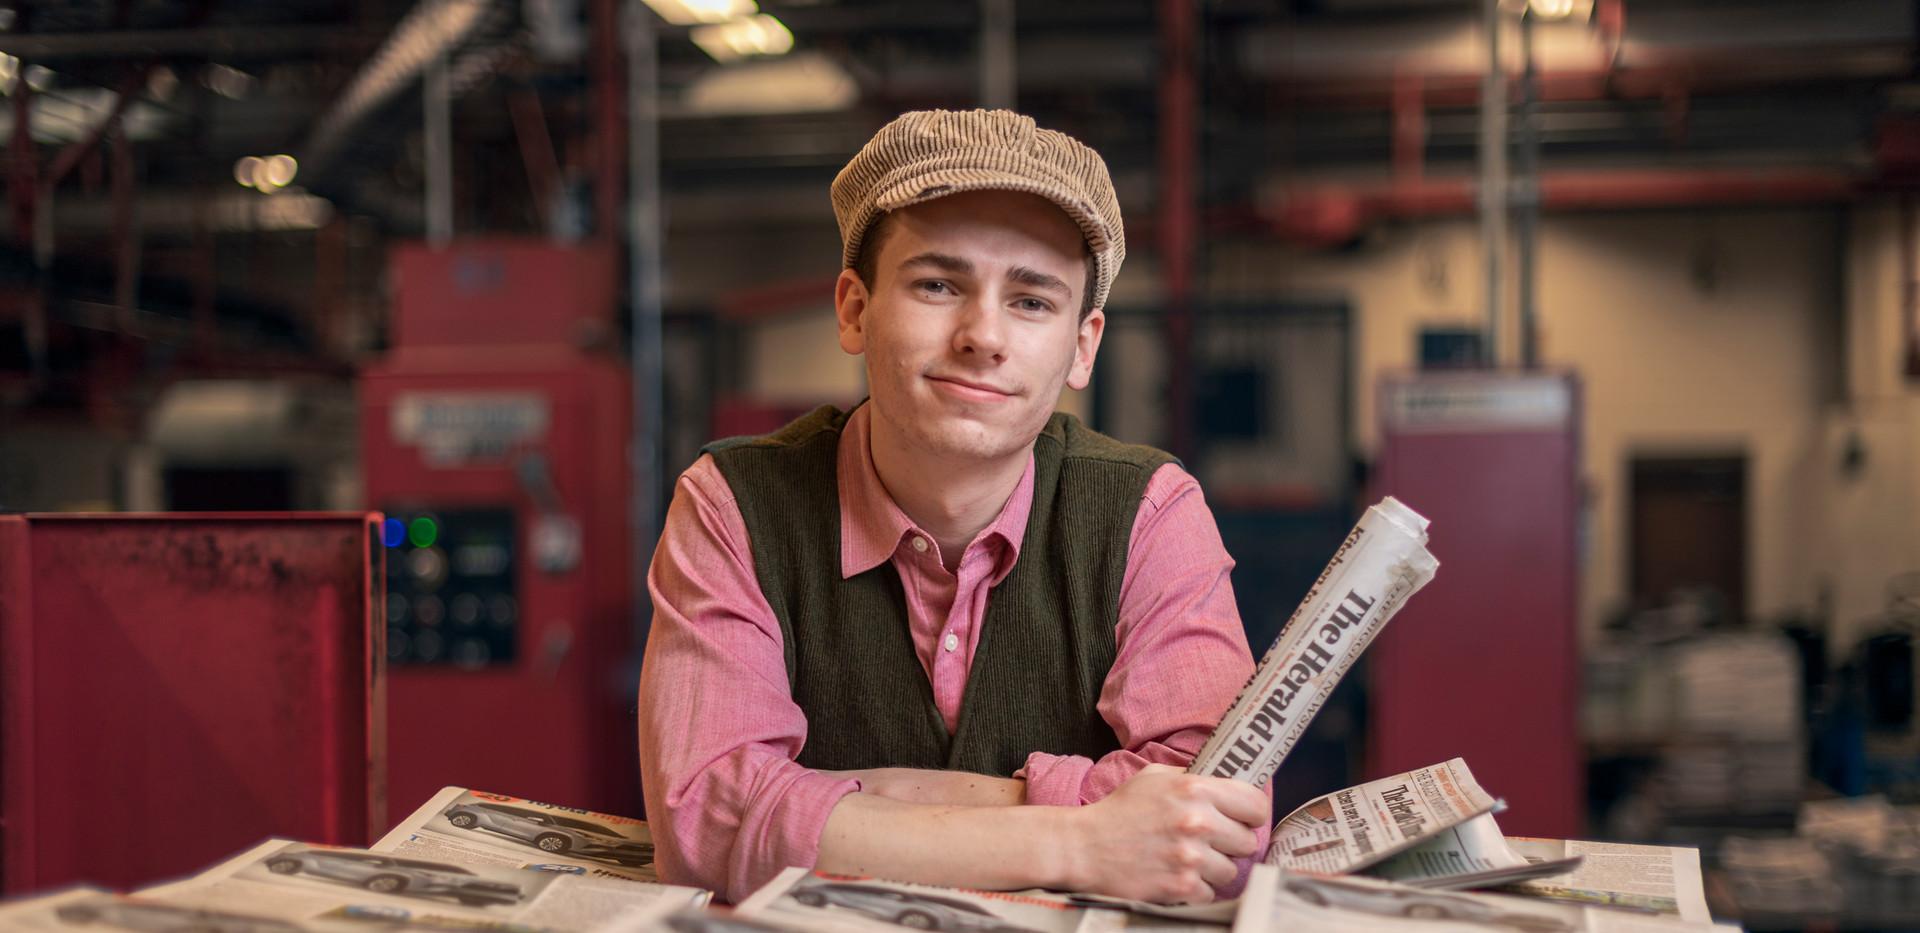 Davey in NEWSIES